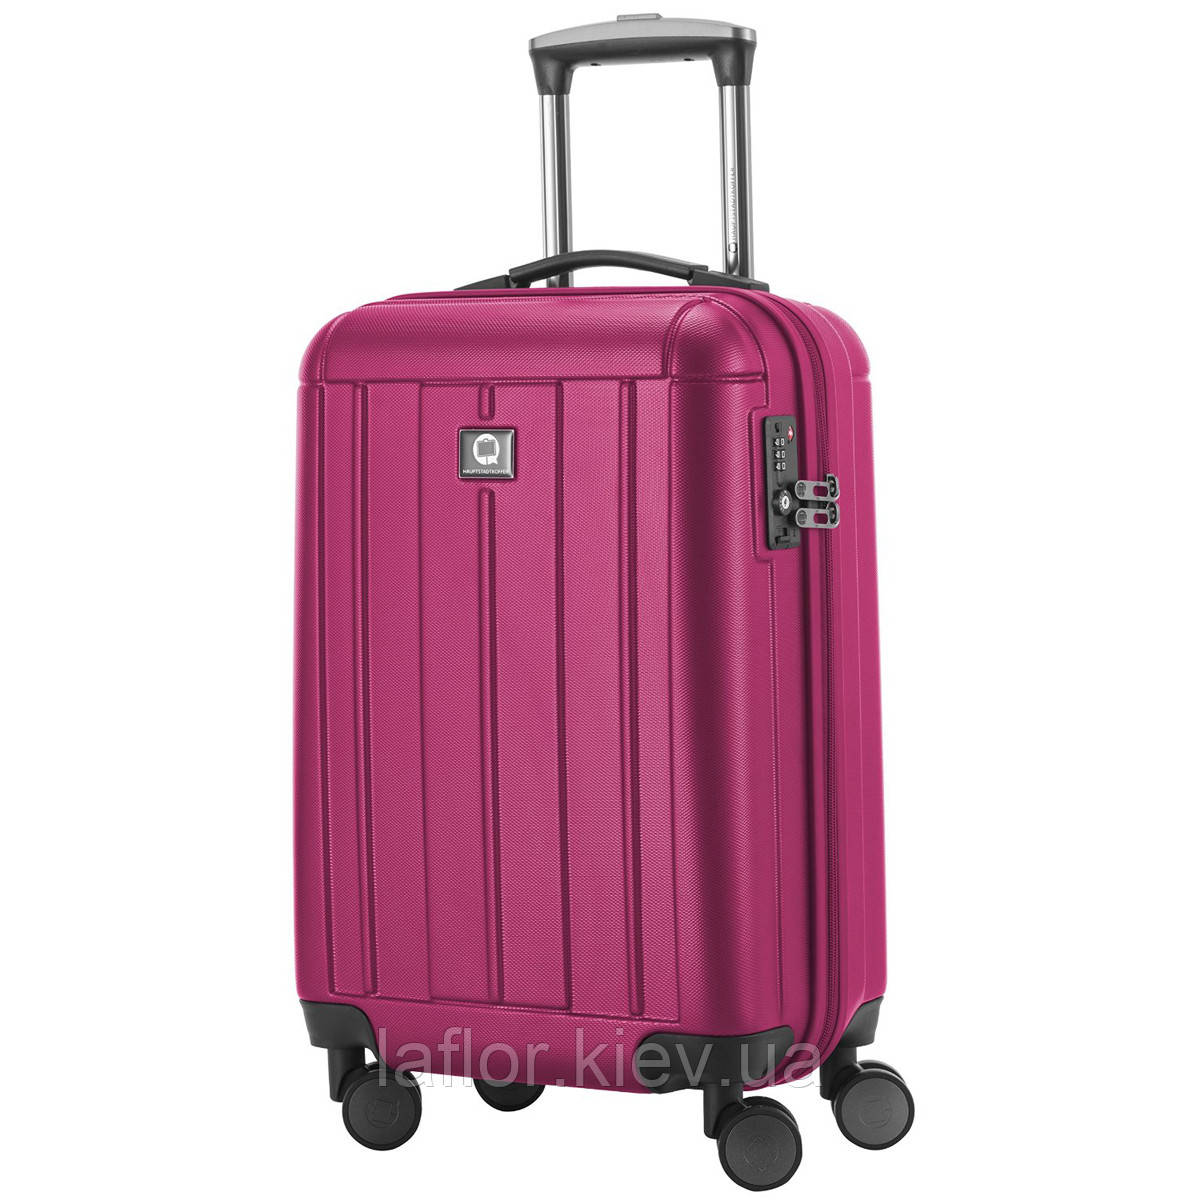 Чемодан на колесиках ТМ Hauptstadtkoffer Kotti Mini розовый матовый